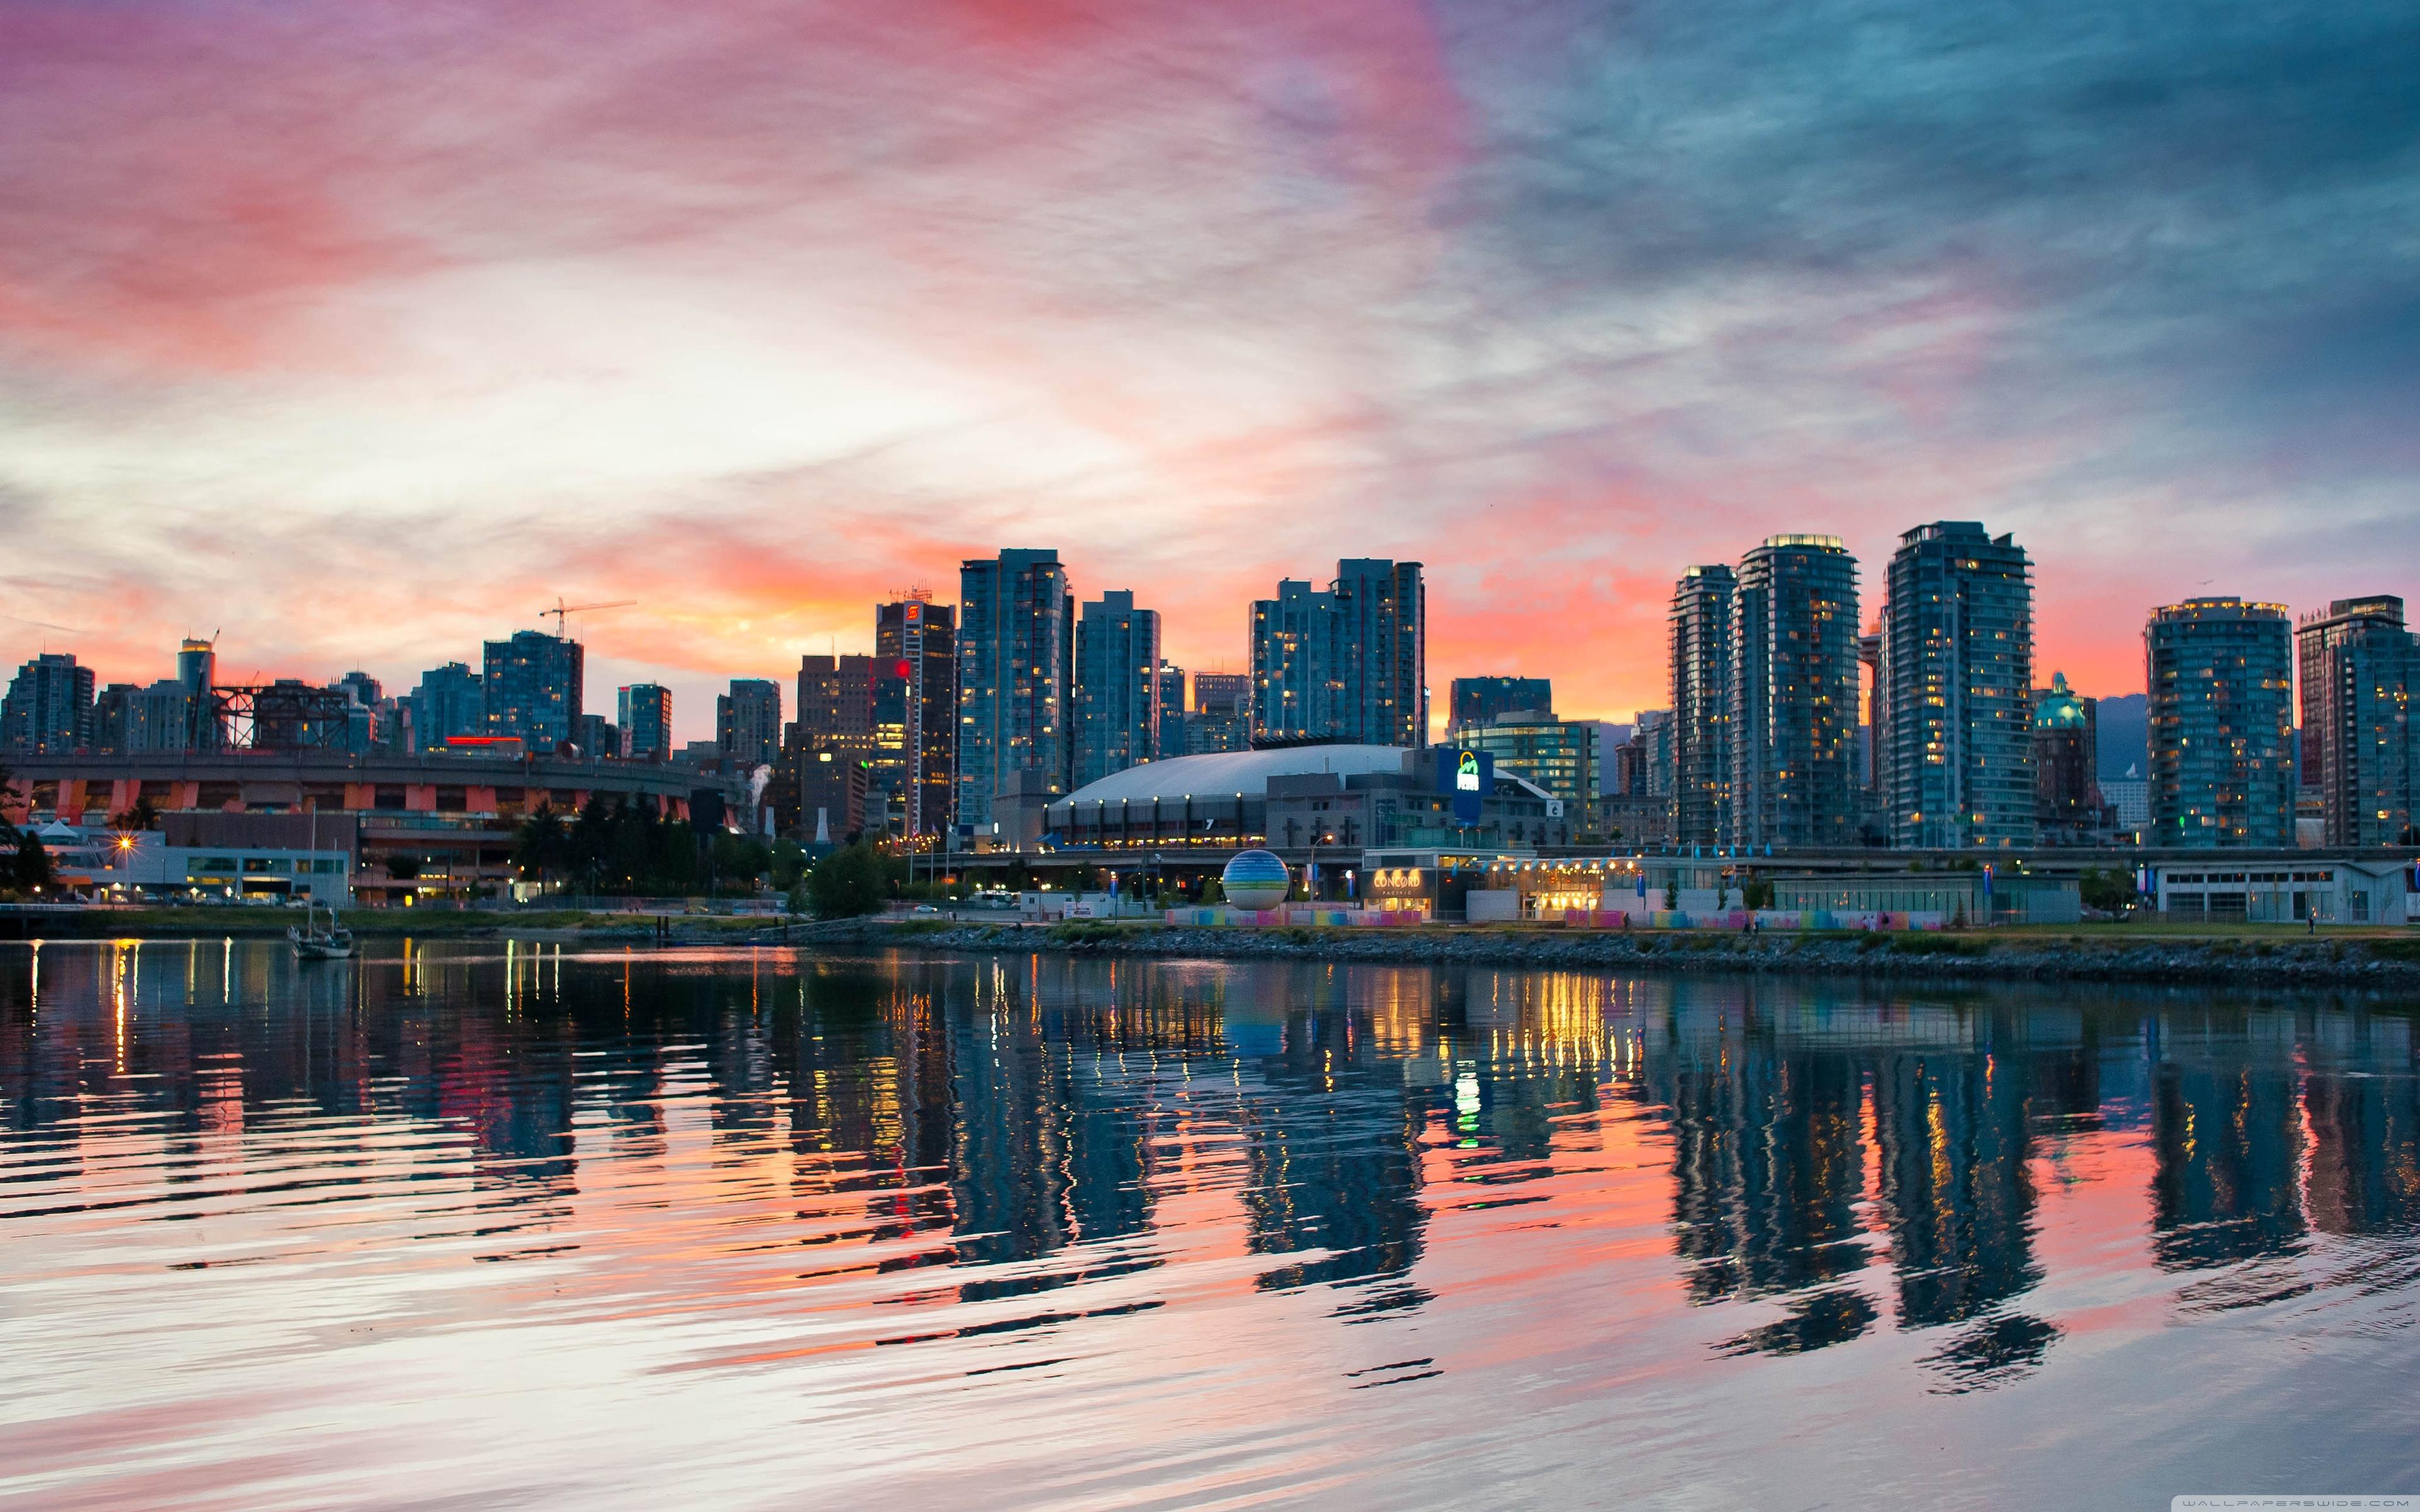 Vancouver Wallpaper 7   3840 X 2400 stmednet 3840x2400